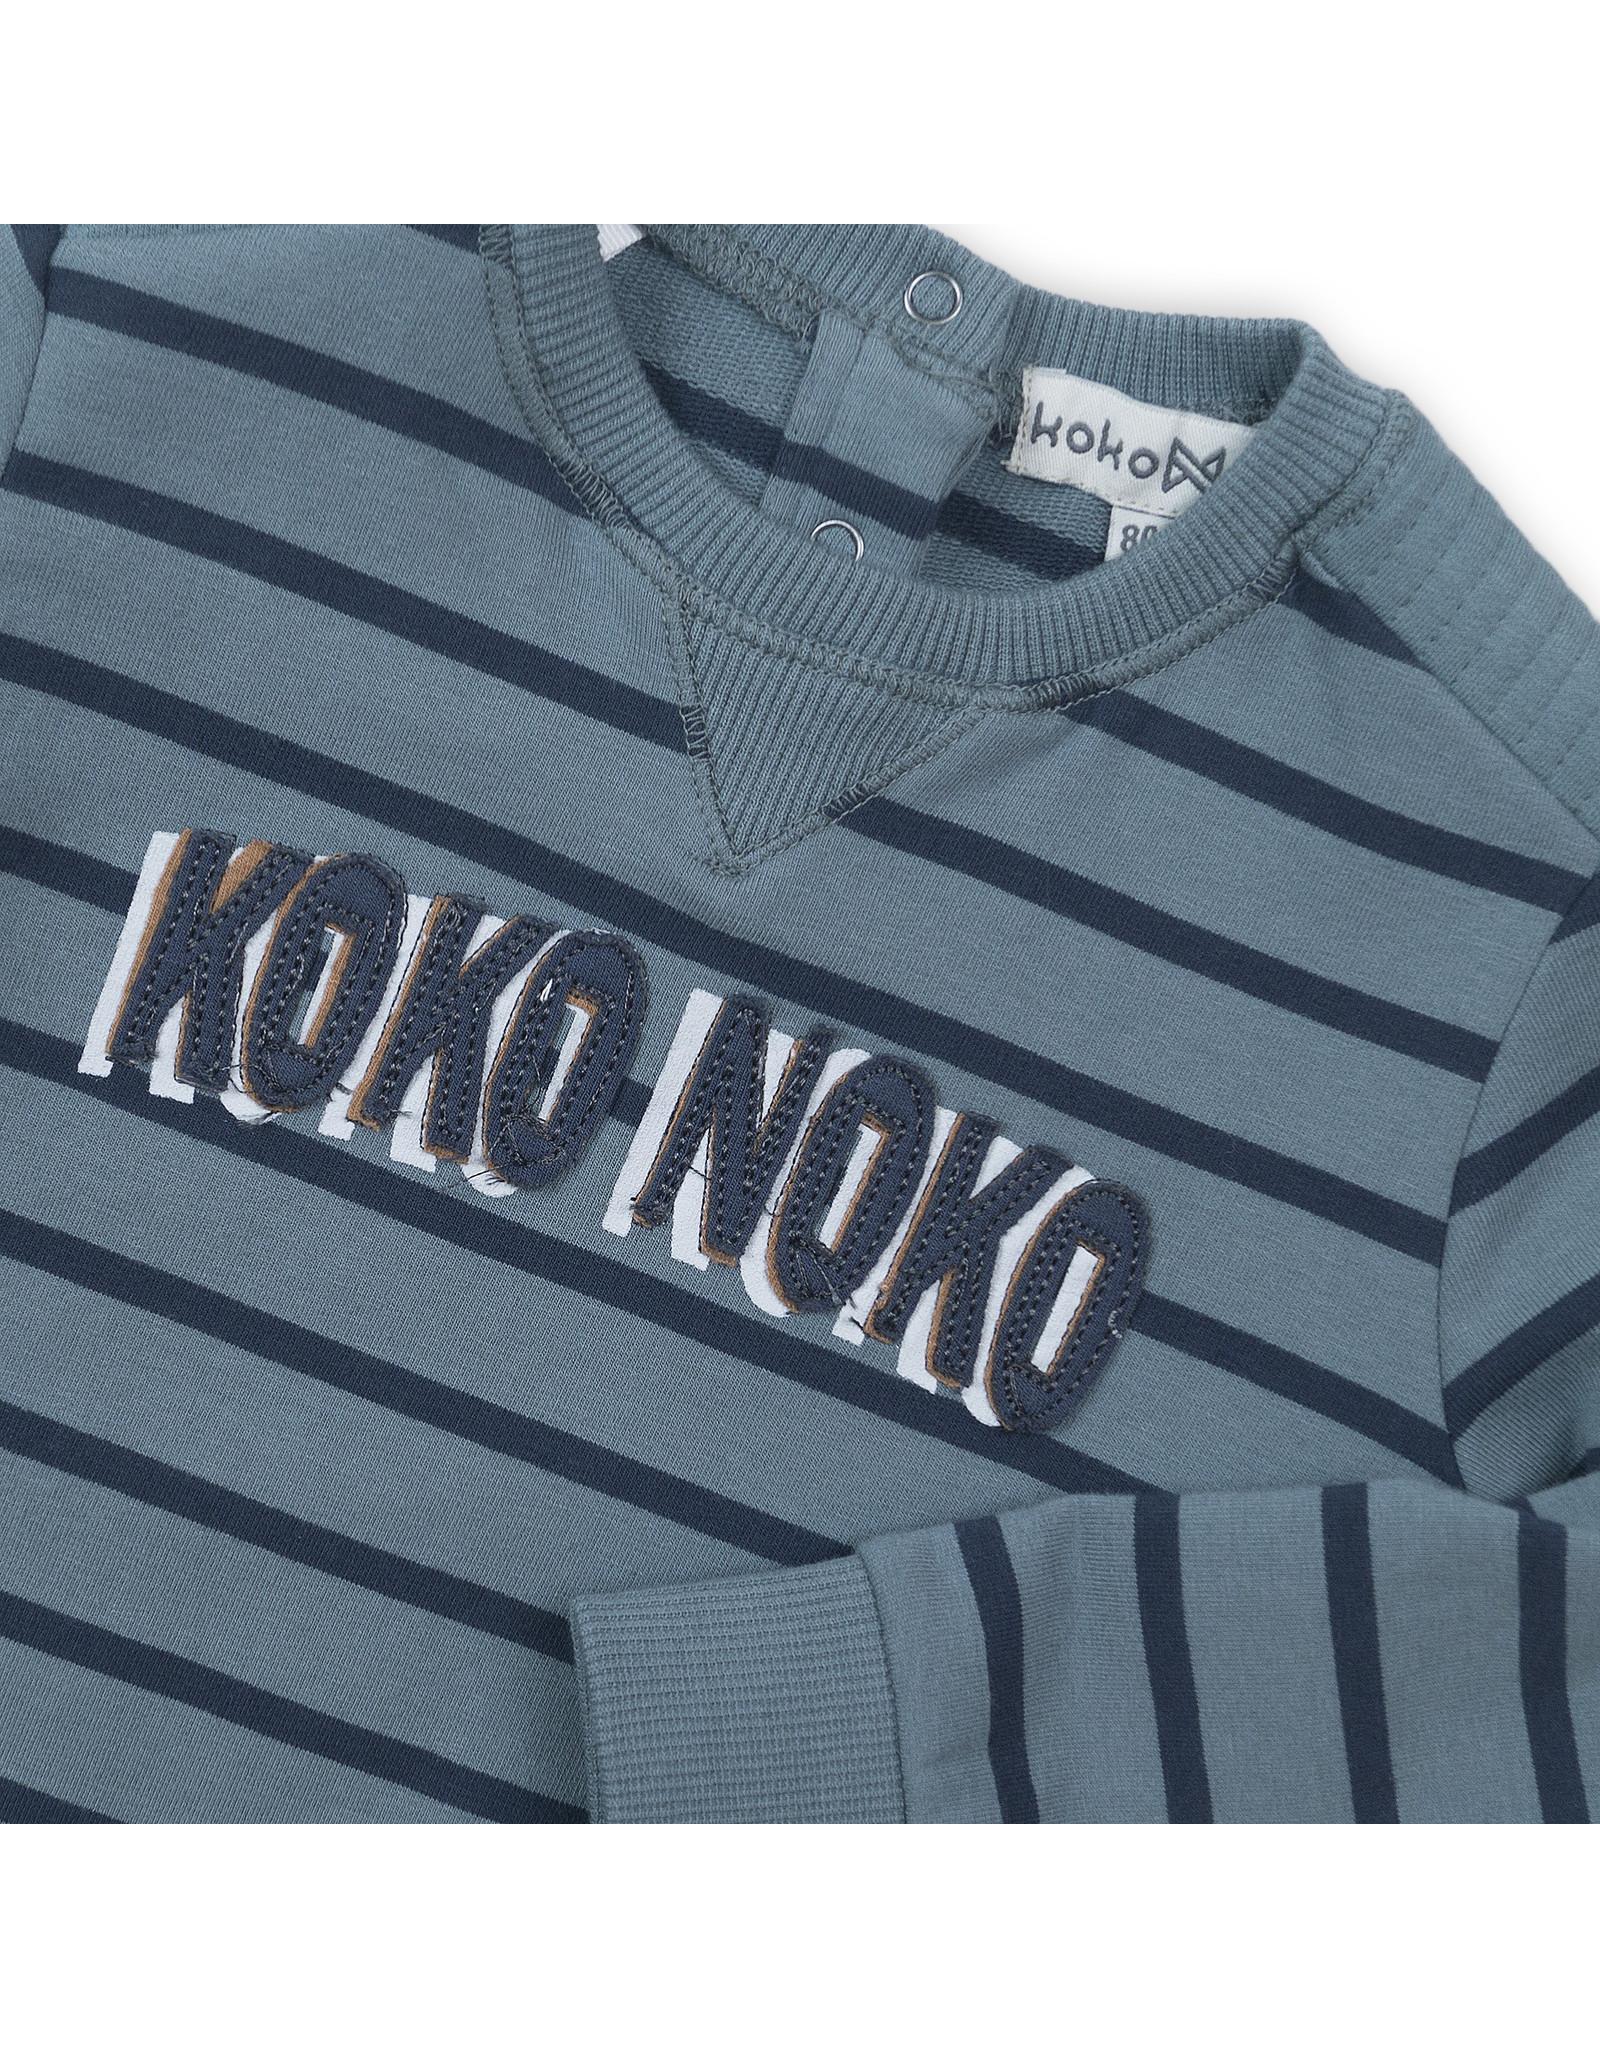 Koko Noko Sweater teal green